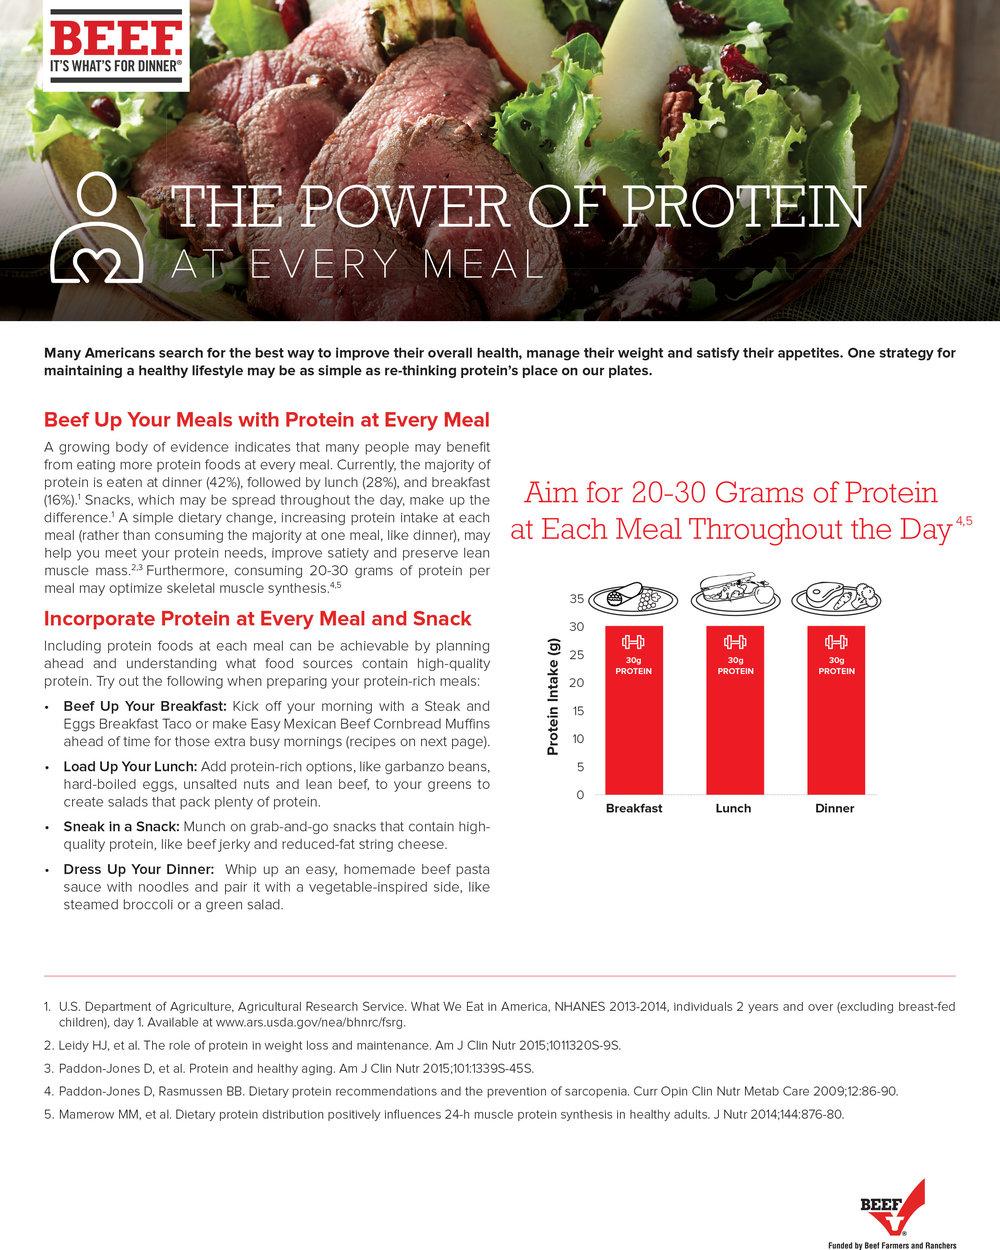 Power-of-Protein-1.jpg